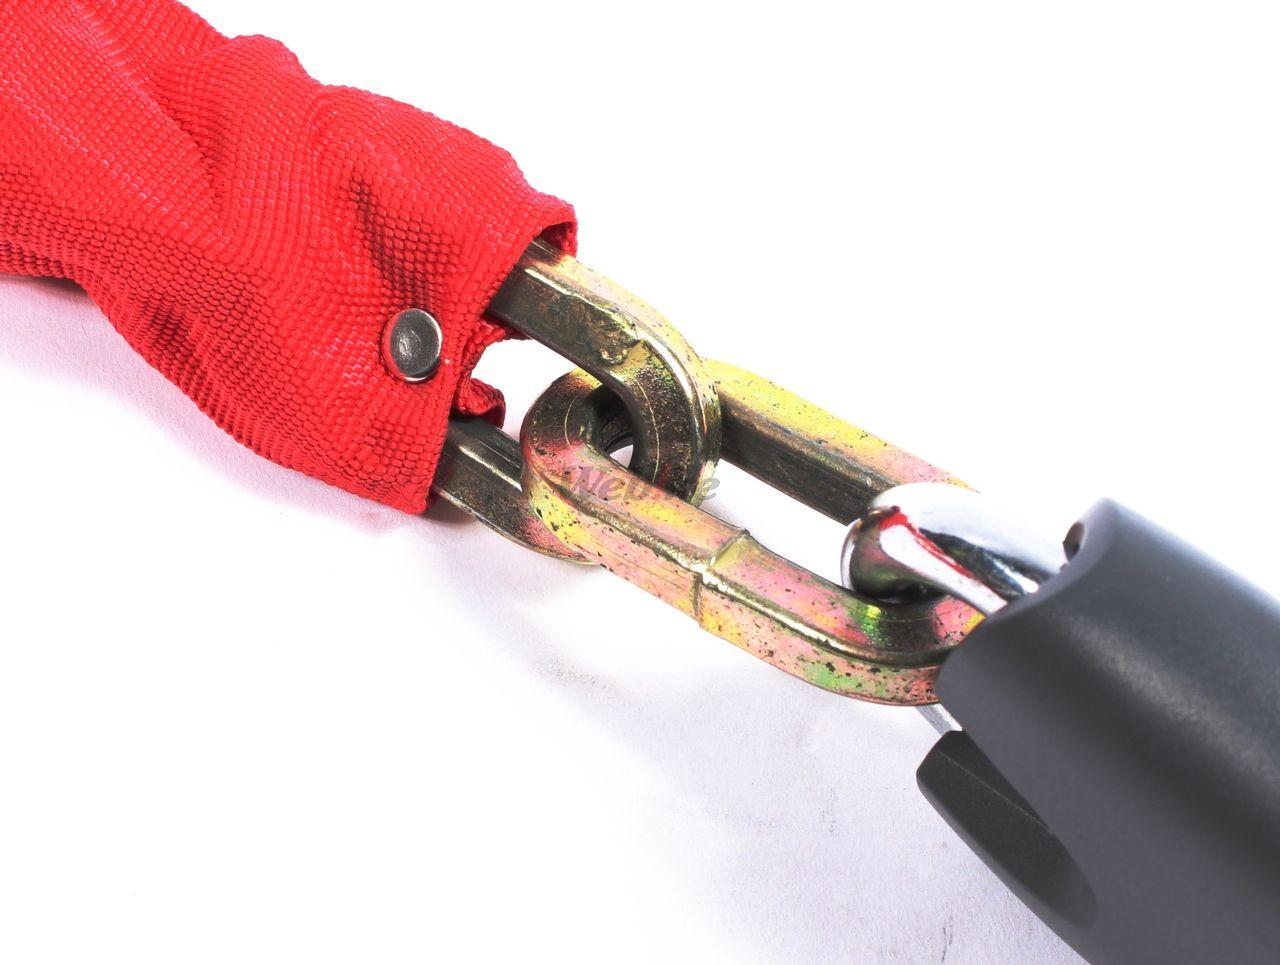 【KOMINE】LK-111 鋼鍊掛鎖 - 「Webike-摩托百貨」